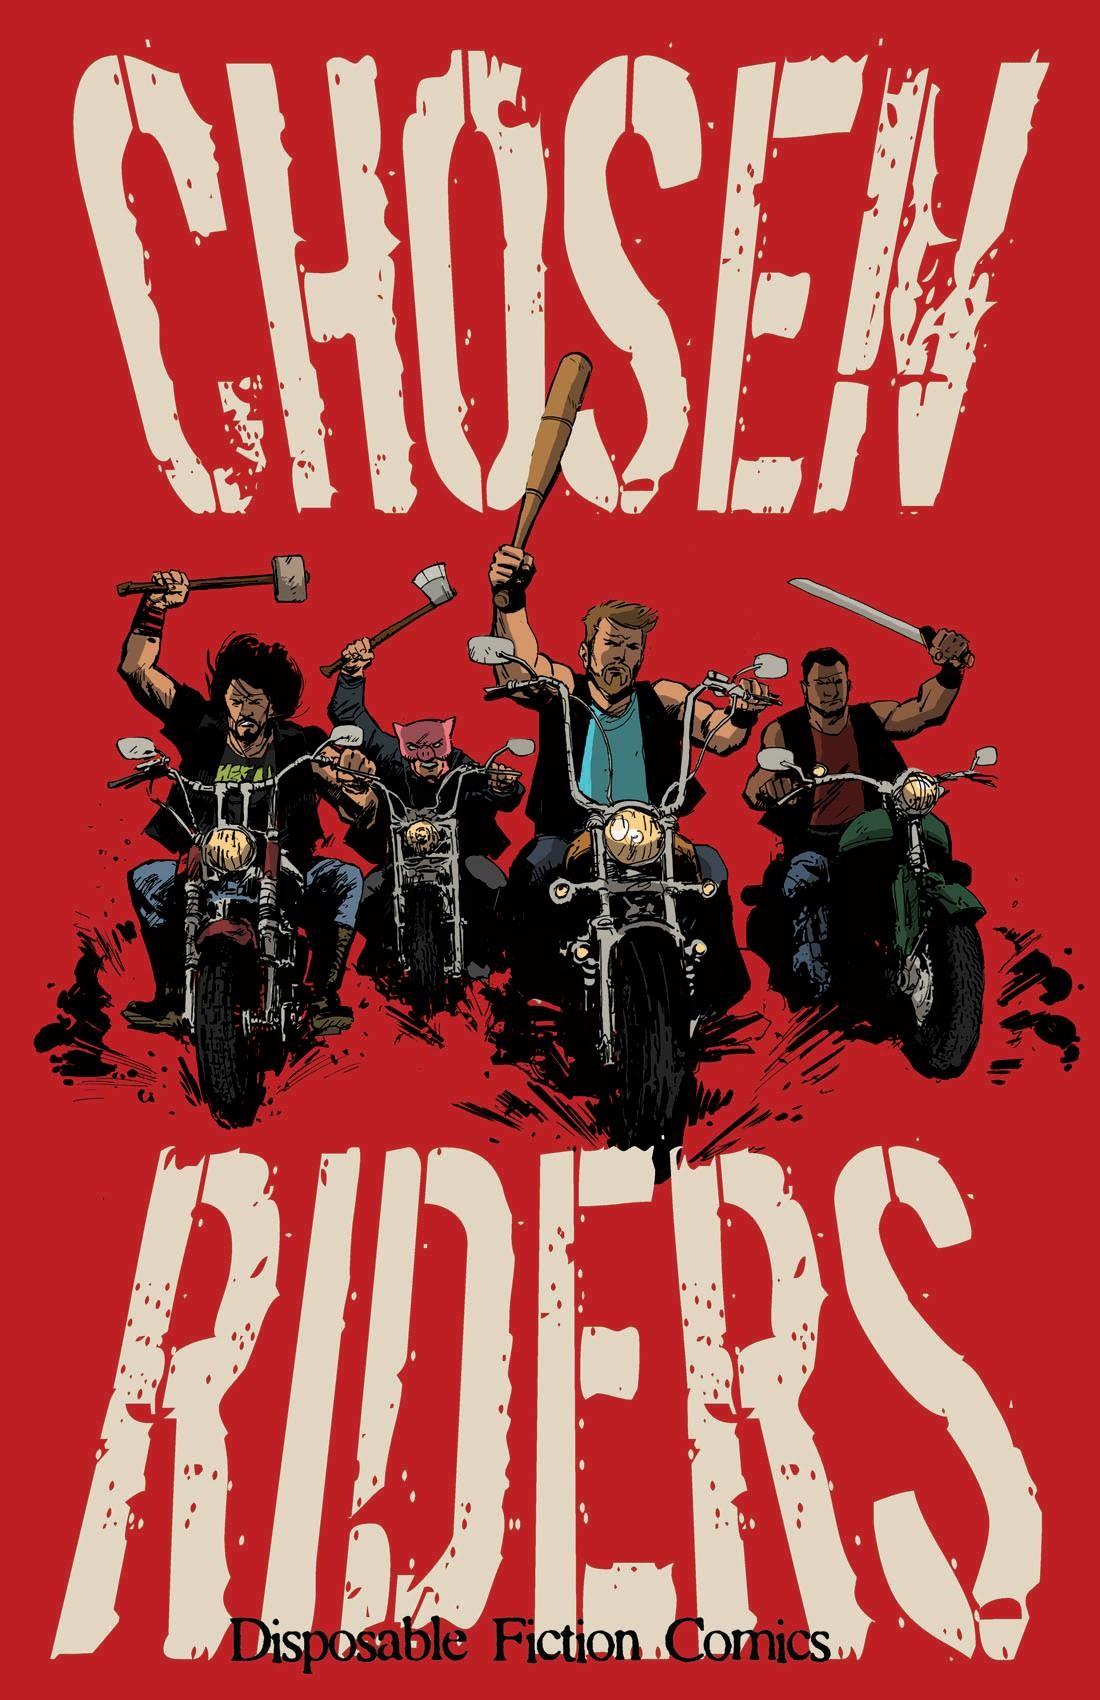 Andre stahlschmidt chosen riders